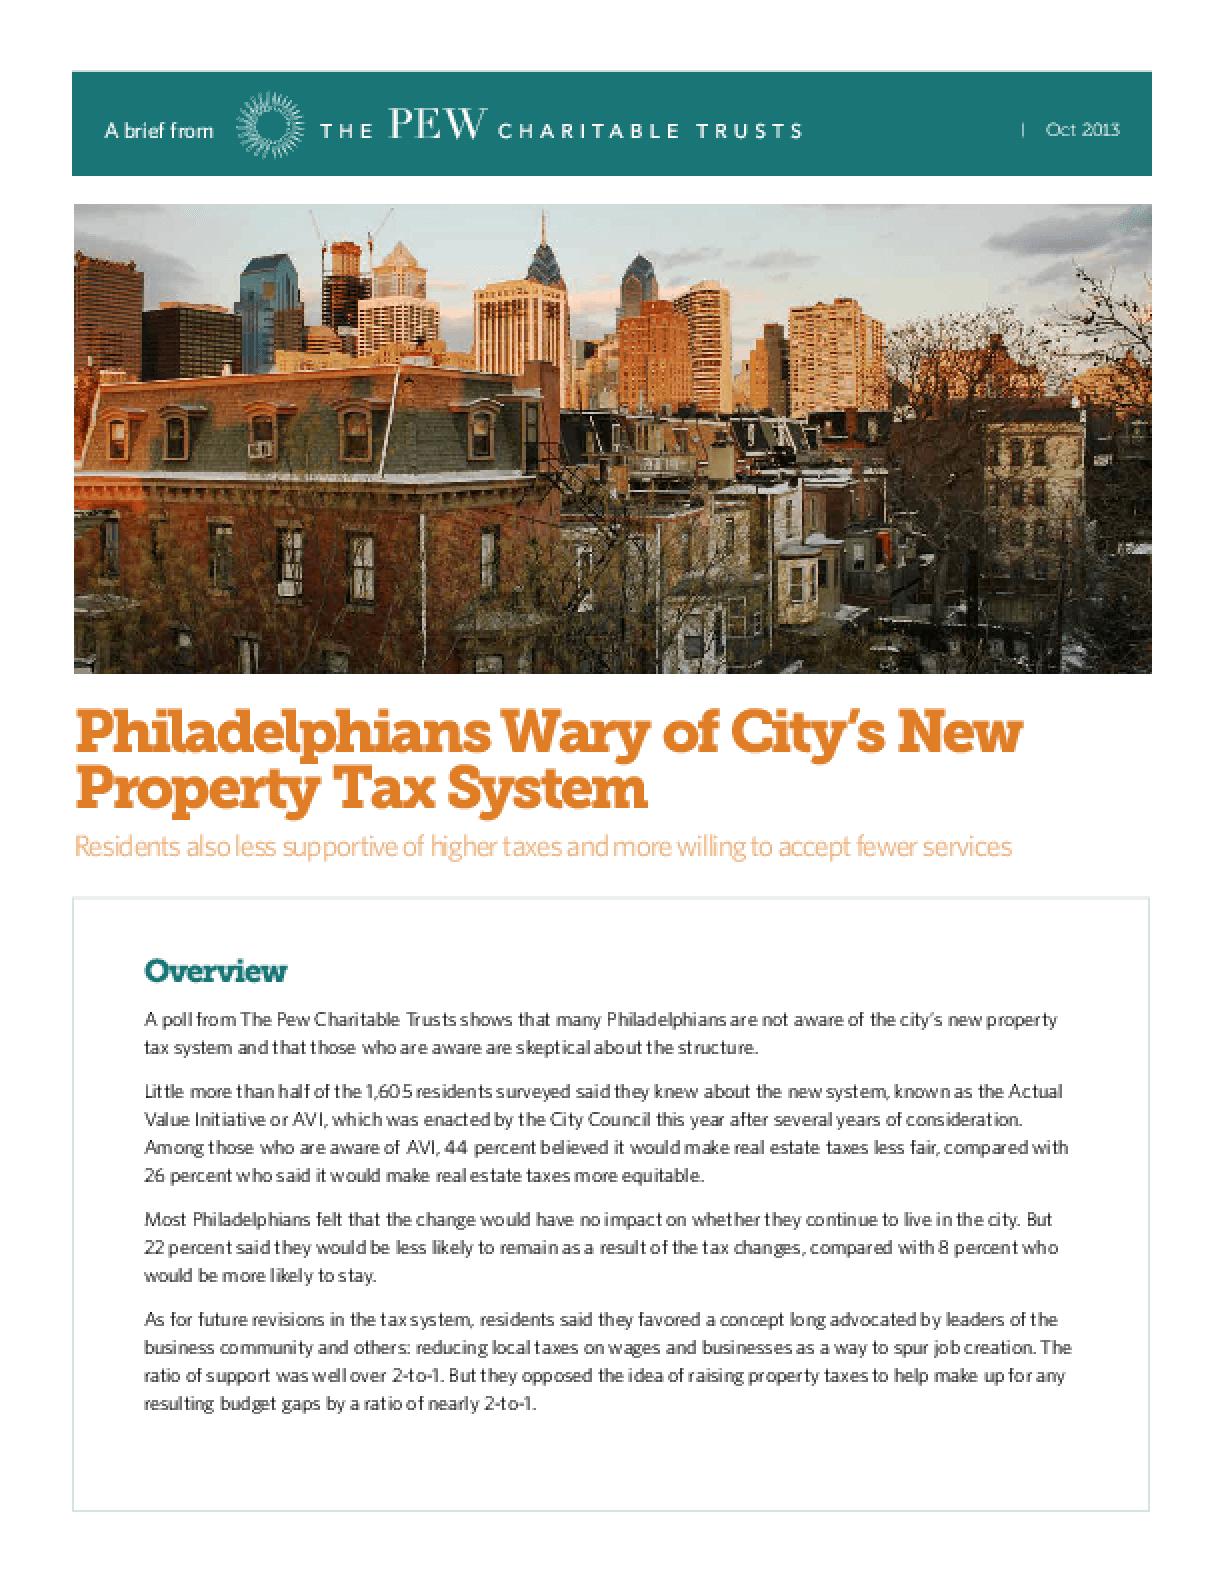 Philadelphians Wary of City's New Property Tax System